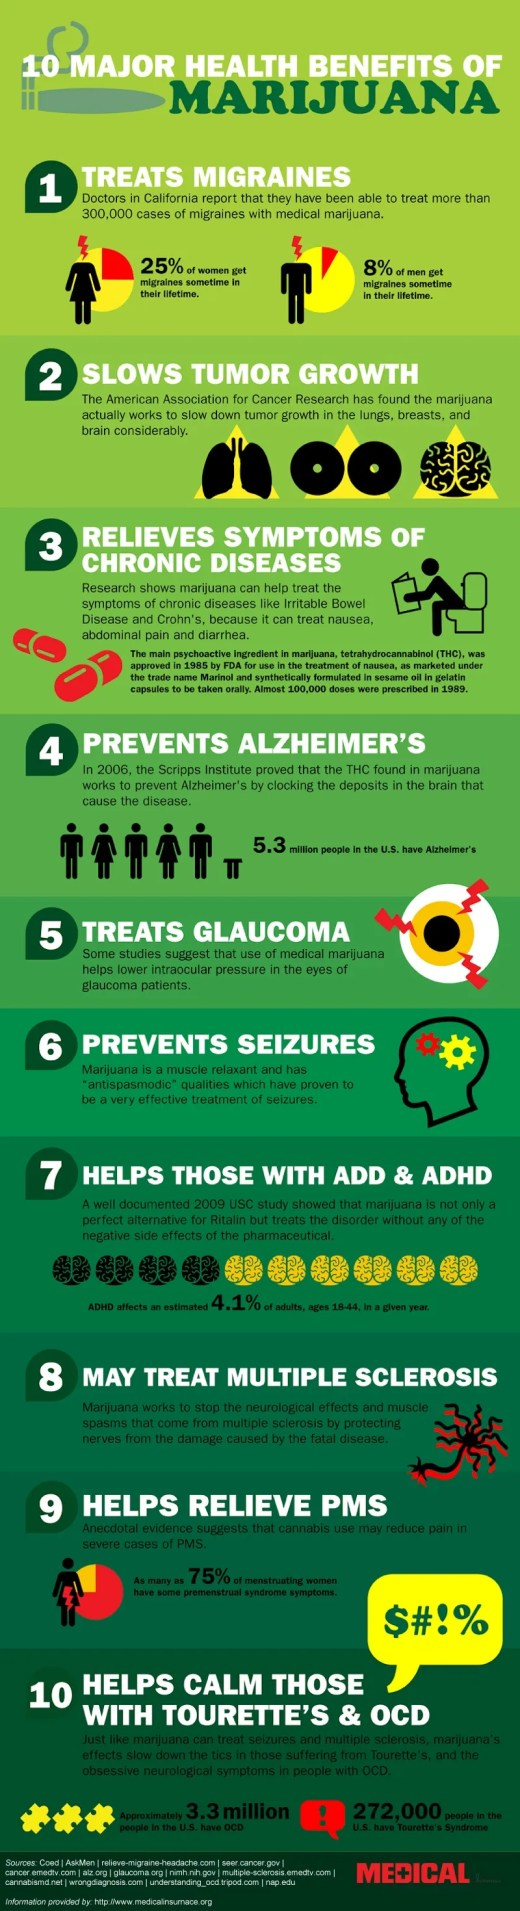 Medical Infographic - Health Benefits of Marijuana